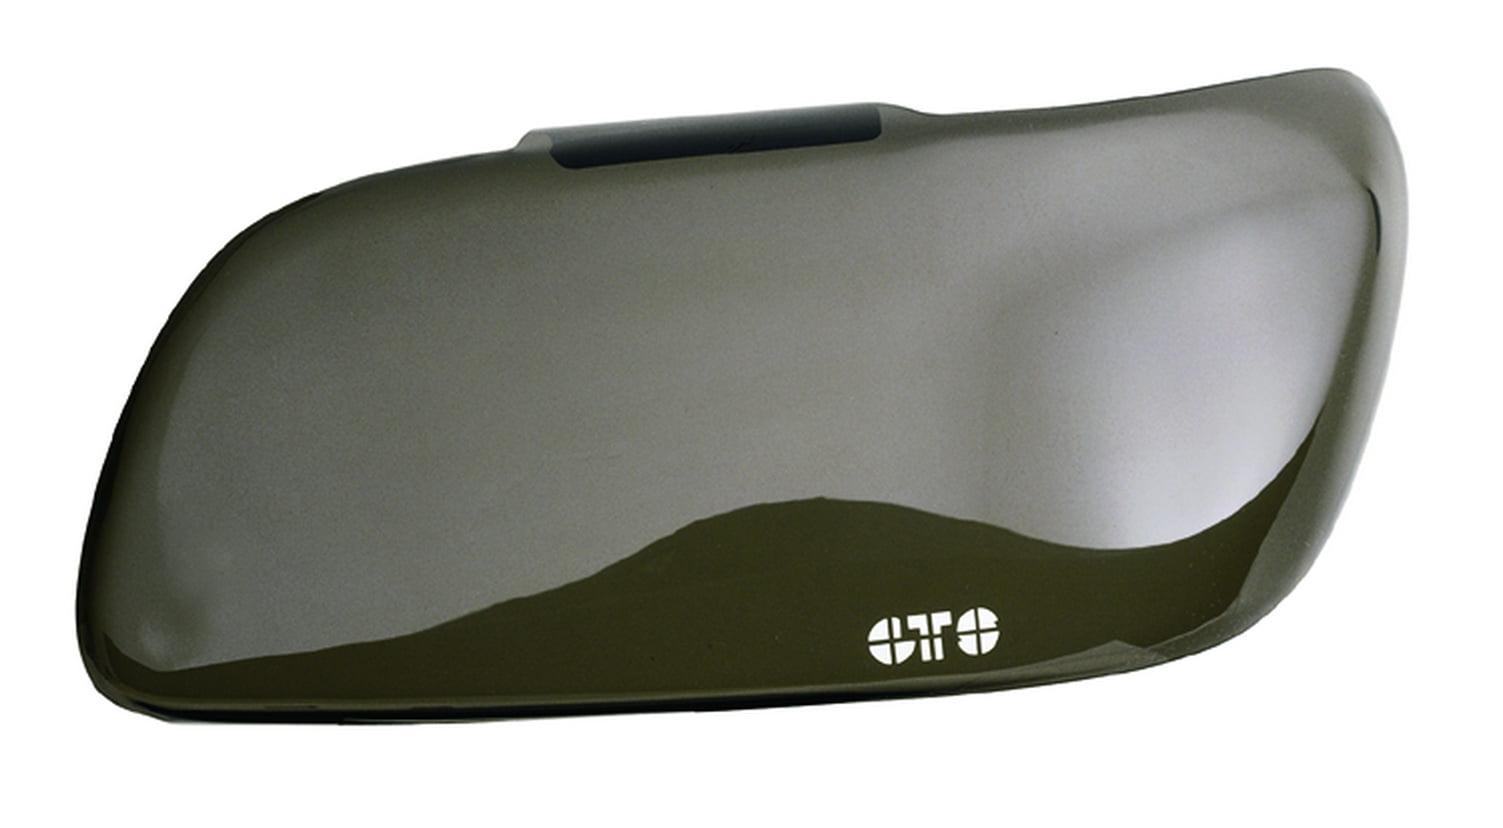 GT Styling GT0325S Smoke Headlight Cover